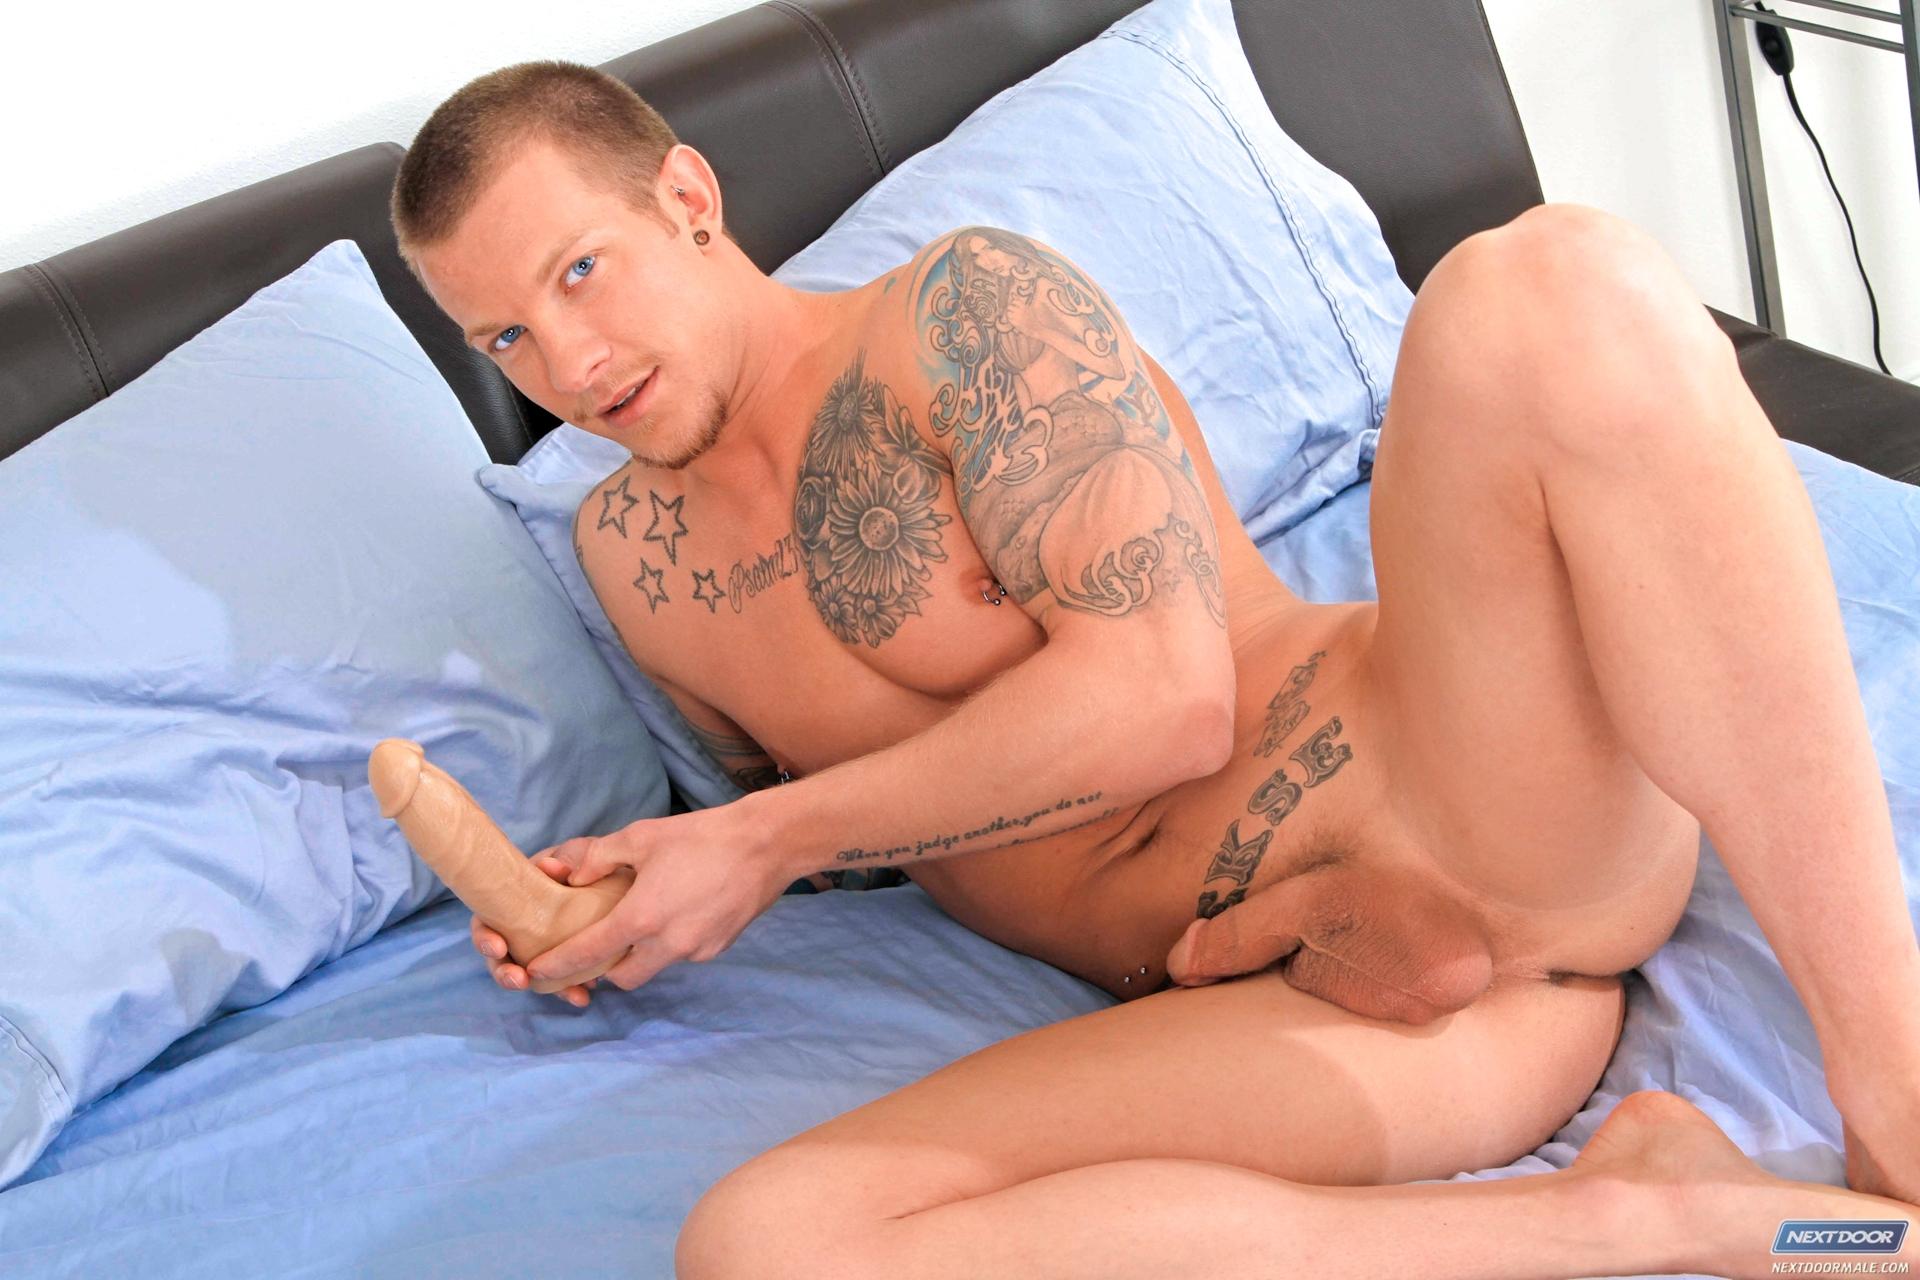 colt-video-porn-stars-boyfriend-video-porn